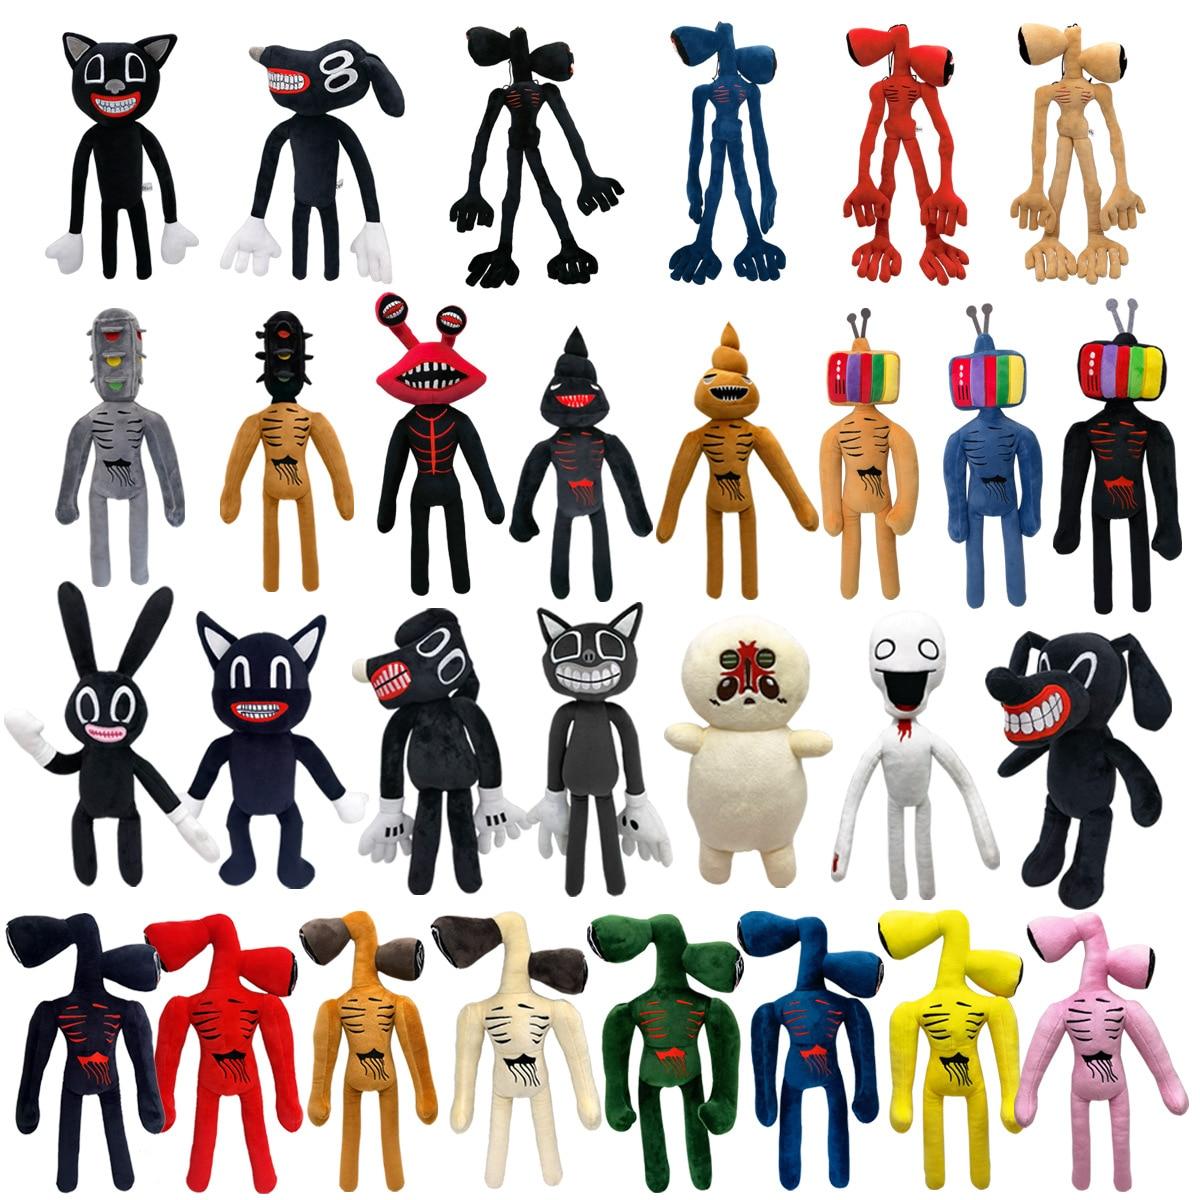 Super Soft Cashmere Siren Head Plush Toys Cartoon Comic Anime Model Doll Stuffed Toy Christmas Birthday Gift For Children недорого